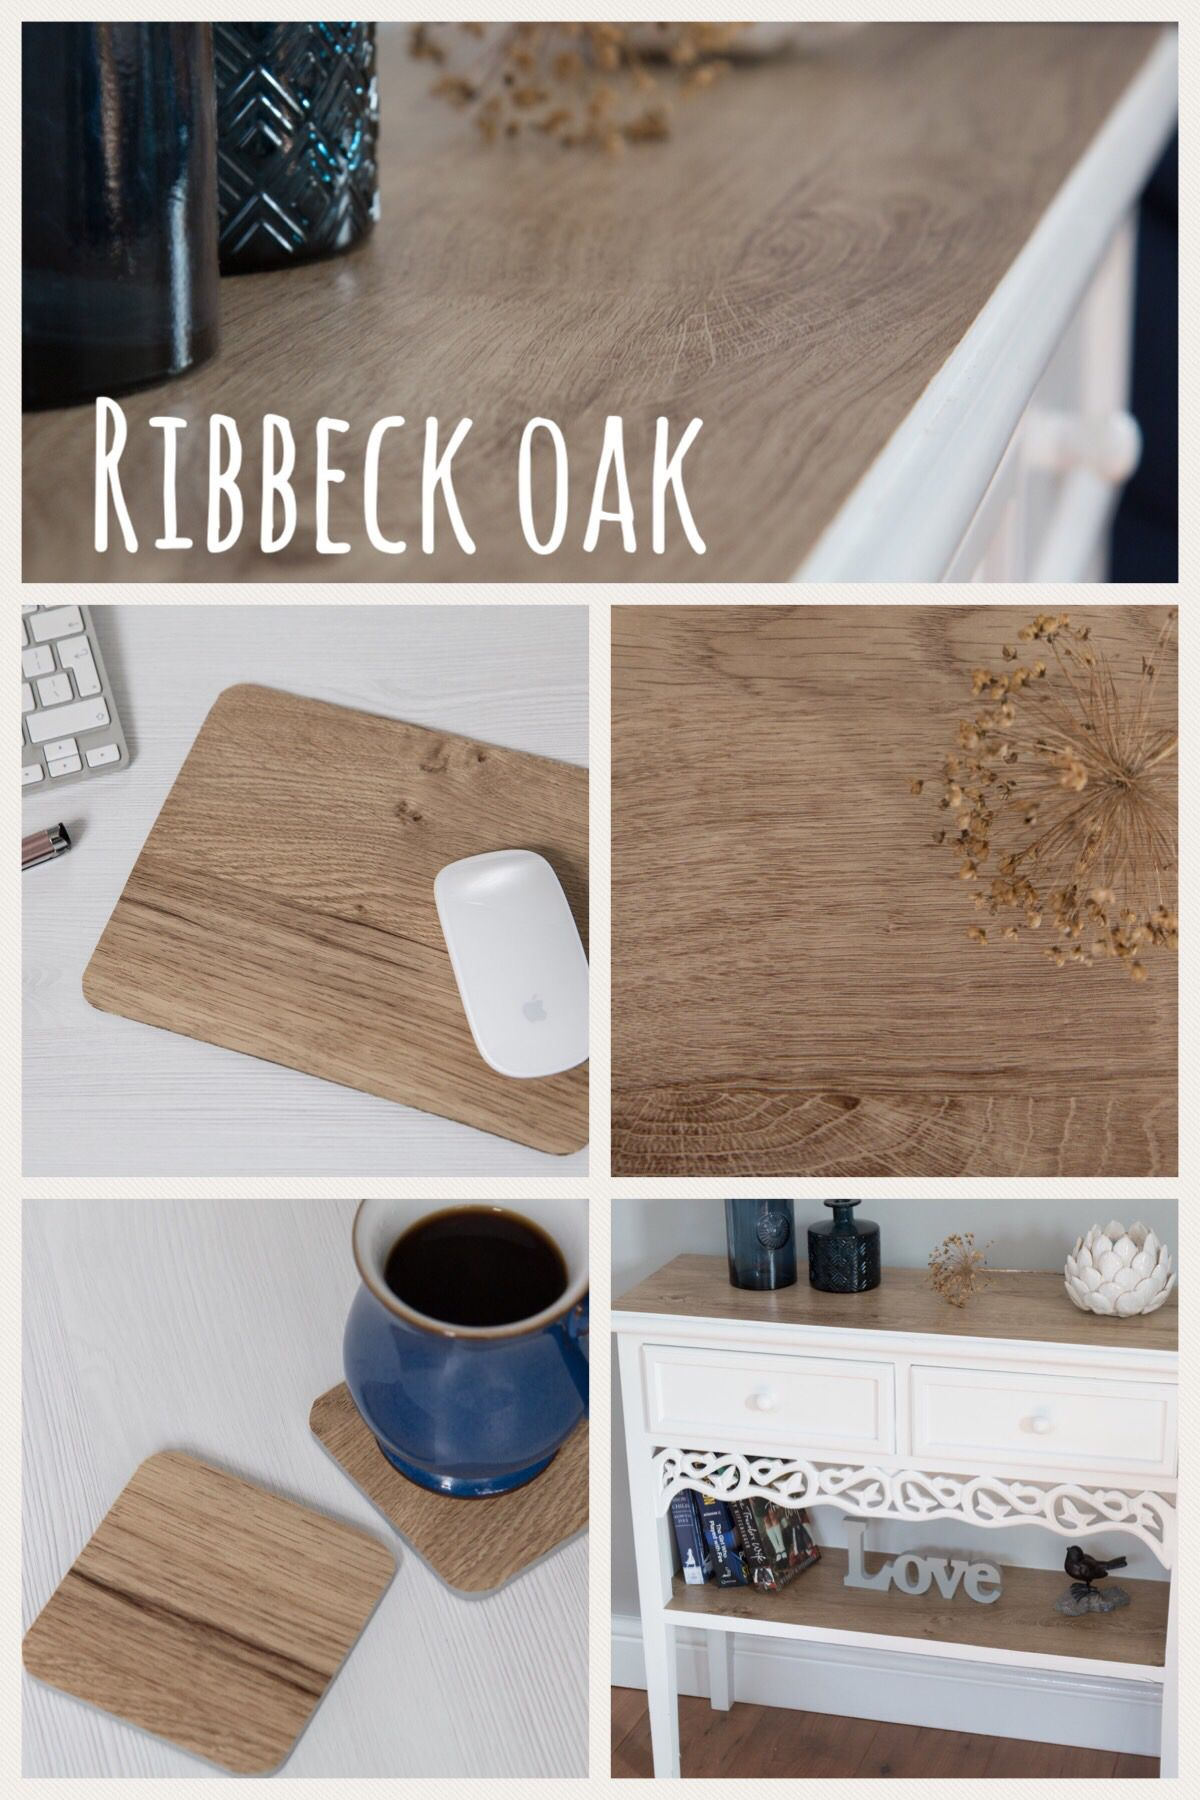 67 5cm X 2m D C Fix Ribbeck Oak Sticky Back Plastic Vinyl Wrap Film 346 8147 In 2020 Sticky Back Plastic Vinyl Wrap Kitchen Kitchen Worktop